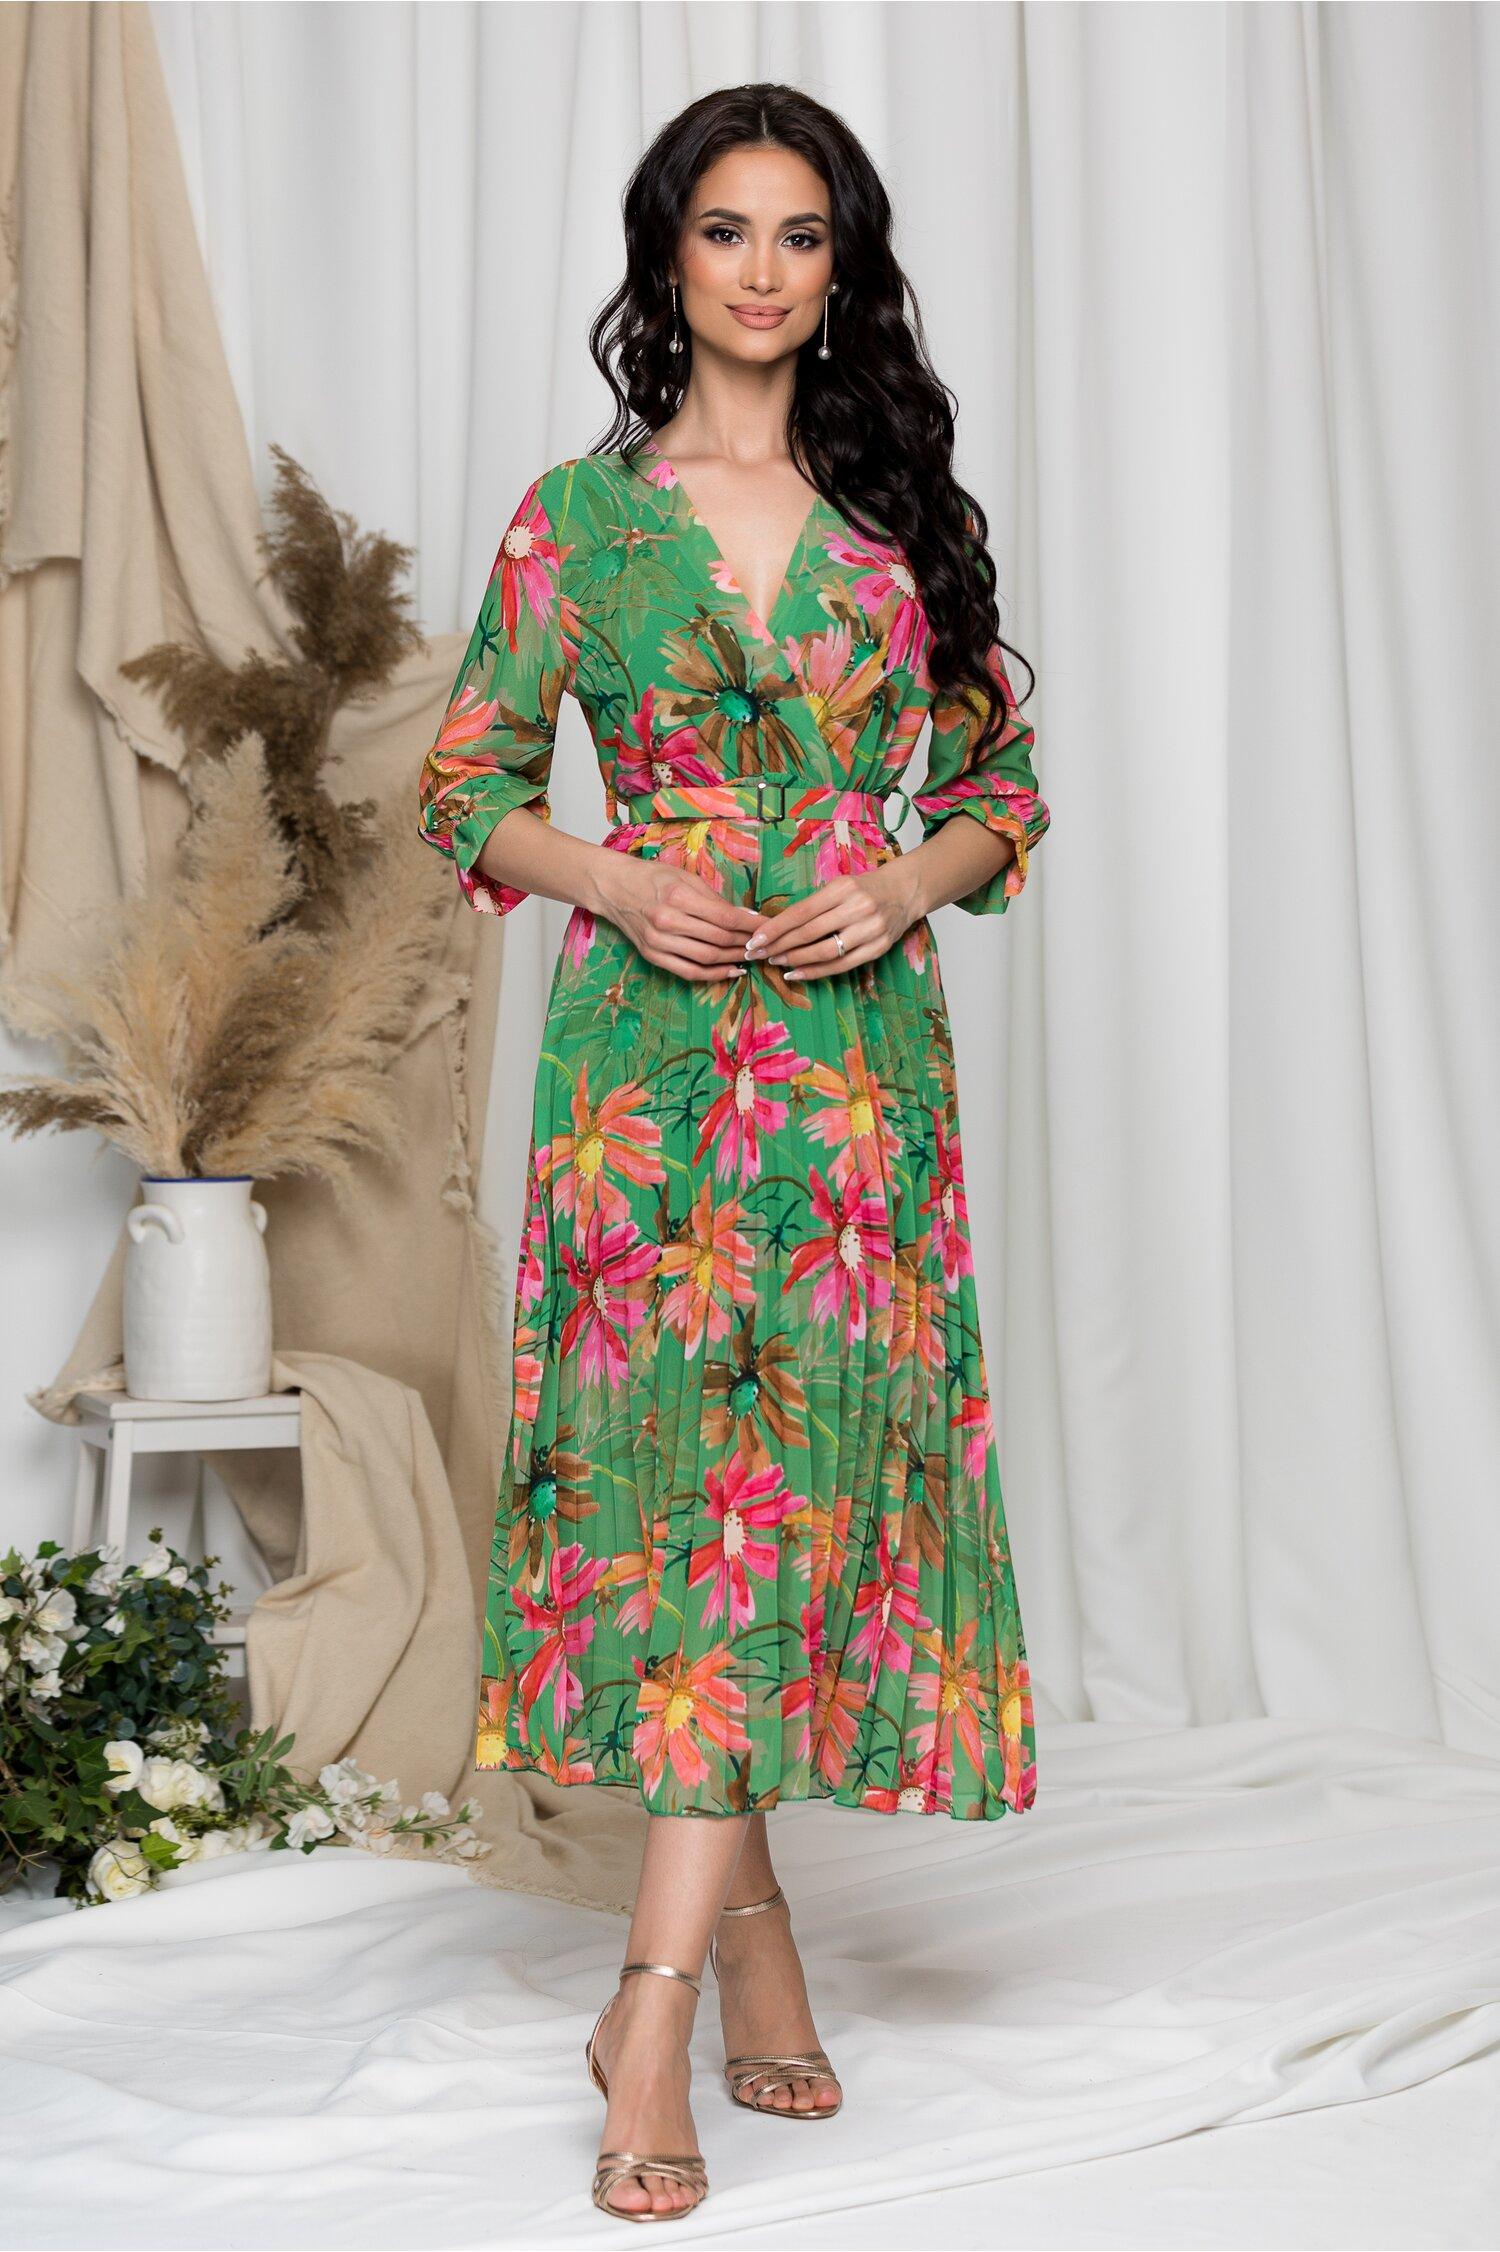 Rochie Beatrice verde cu imprimeu floral imagine dyfashion.ro 2021